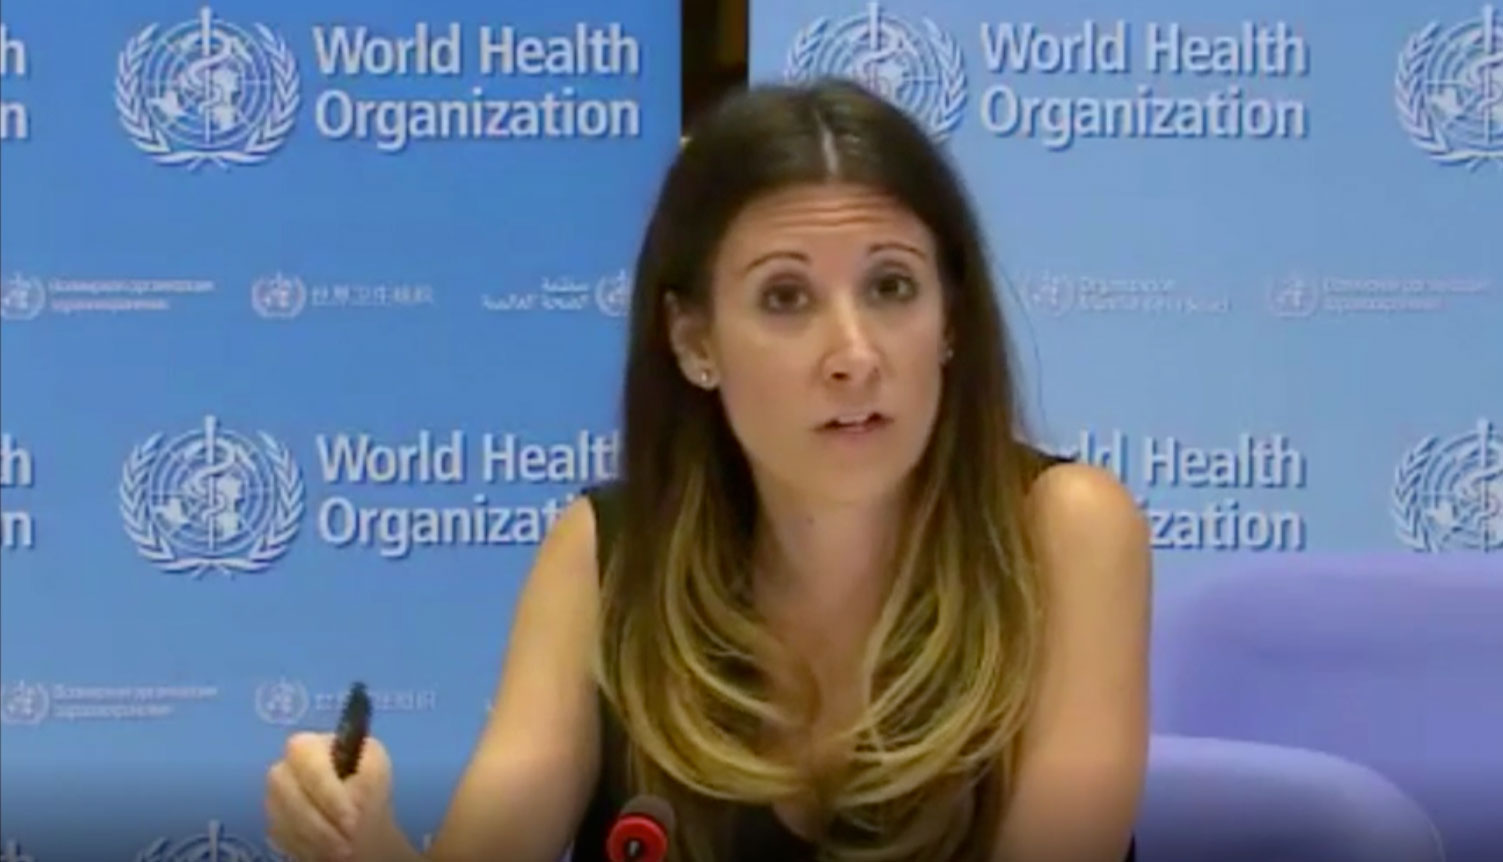 Dr. Maria van Kerkhove speaks during a World Health Organization briefing on April 29.